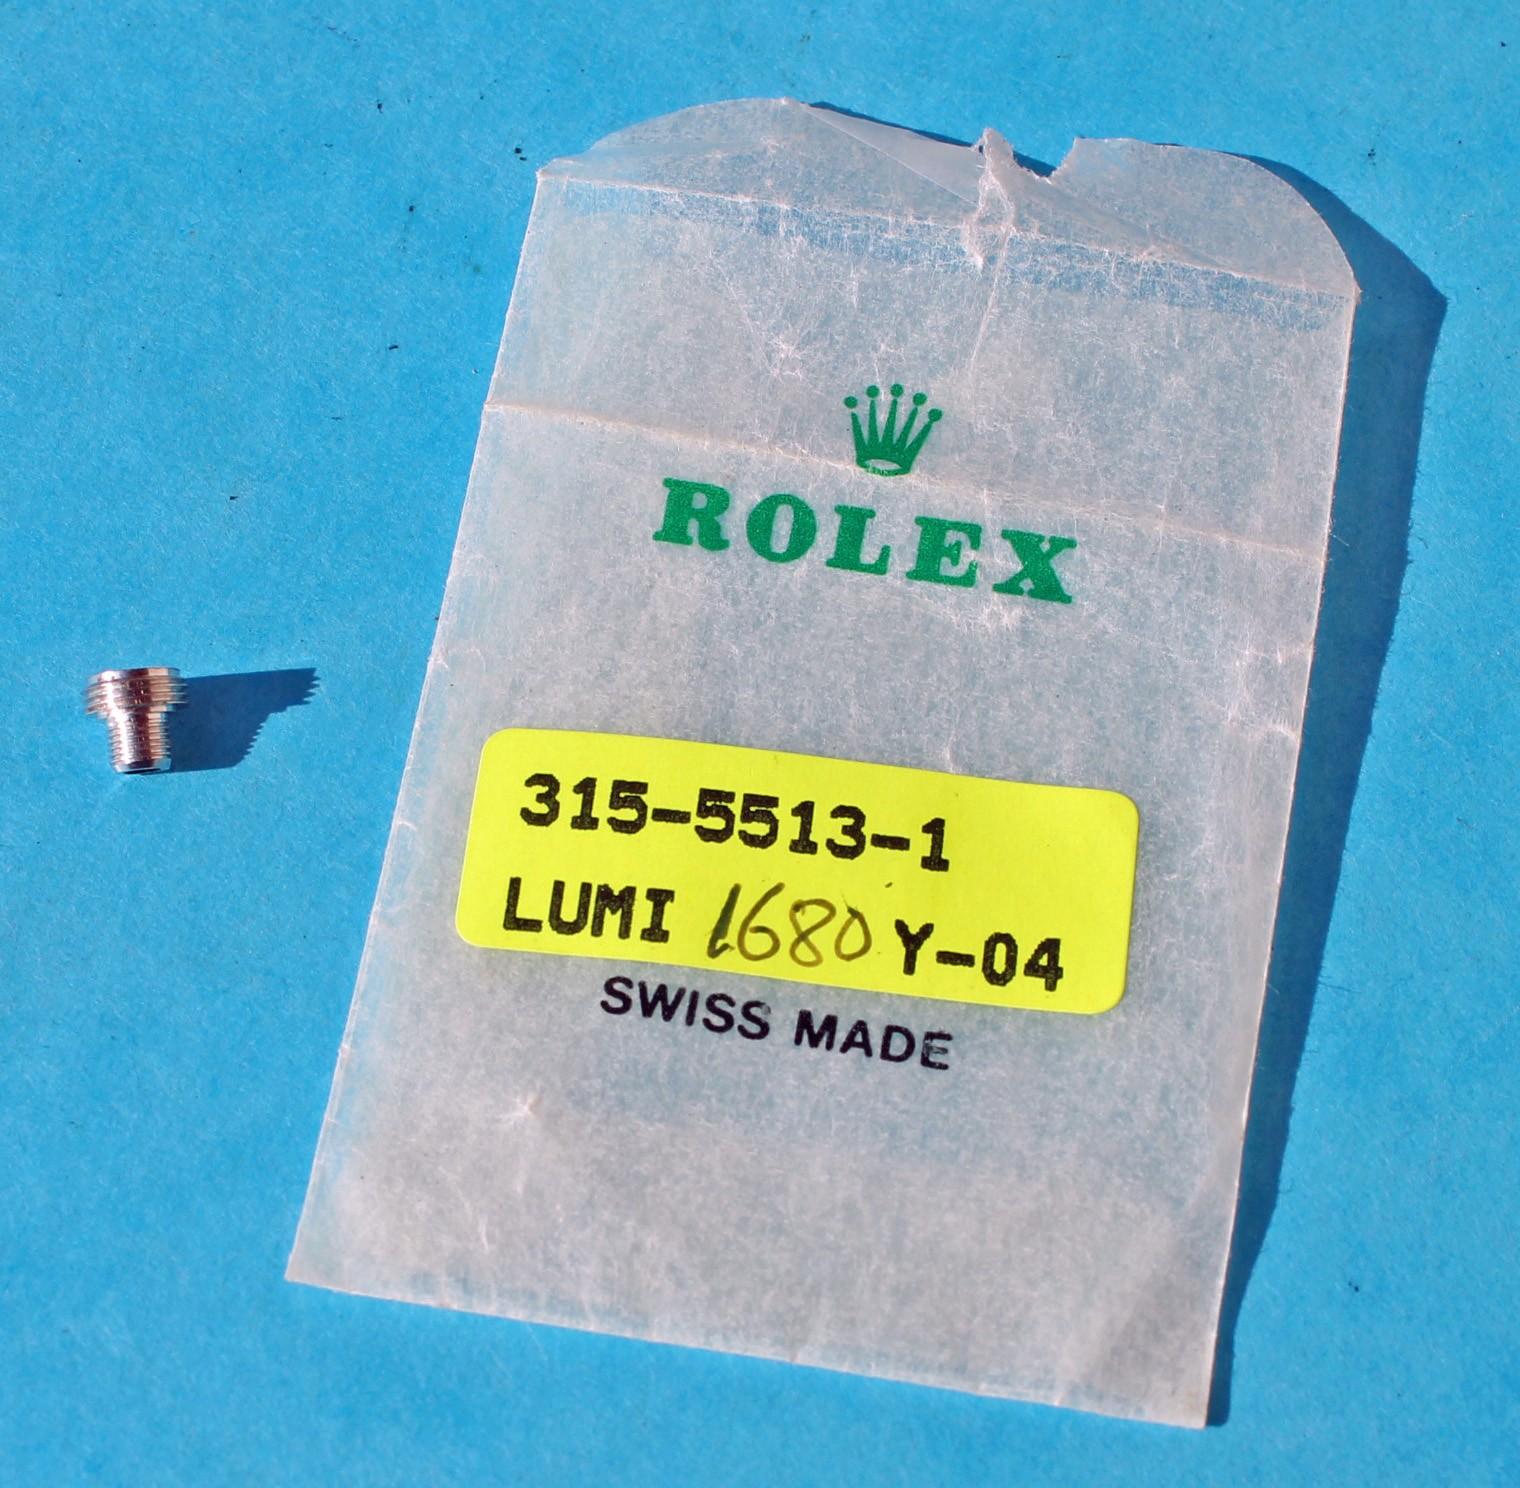 ★Rolex, Tudor Rare 24-700 Twinlock crown tube old submariner 5512, 5513, 1680, 1665 Sea-Dweller, Daytona 6263, 6265, 6239, 6241★